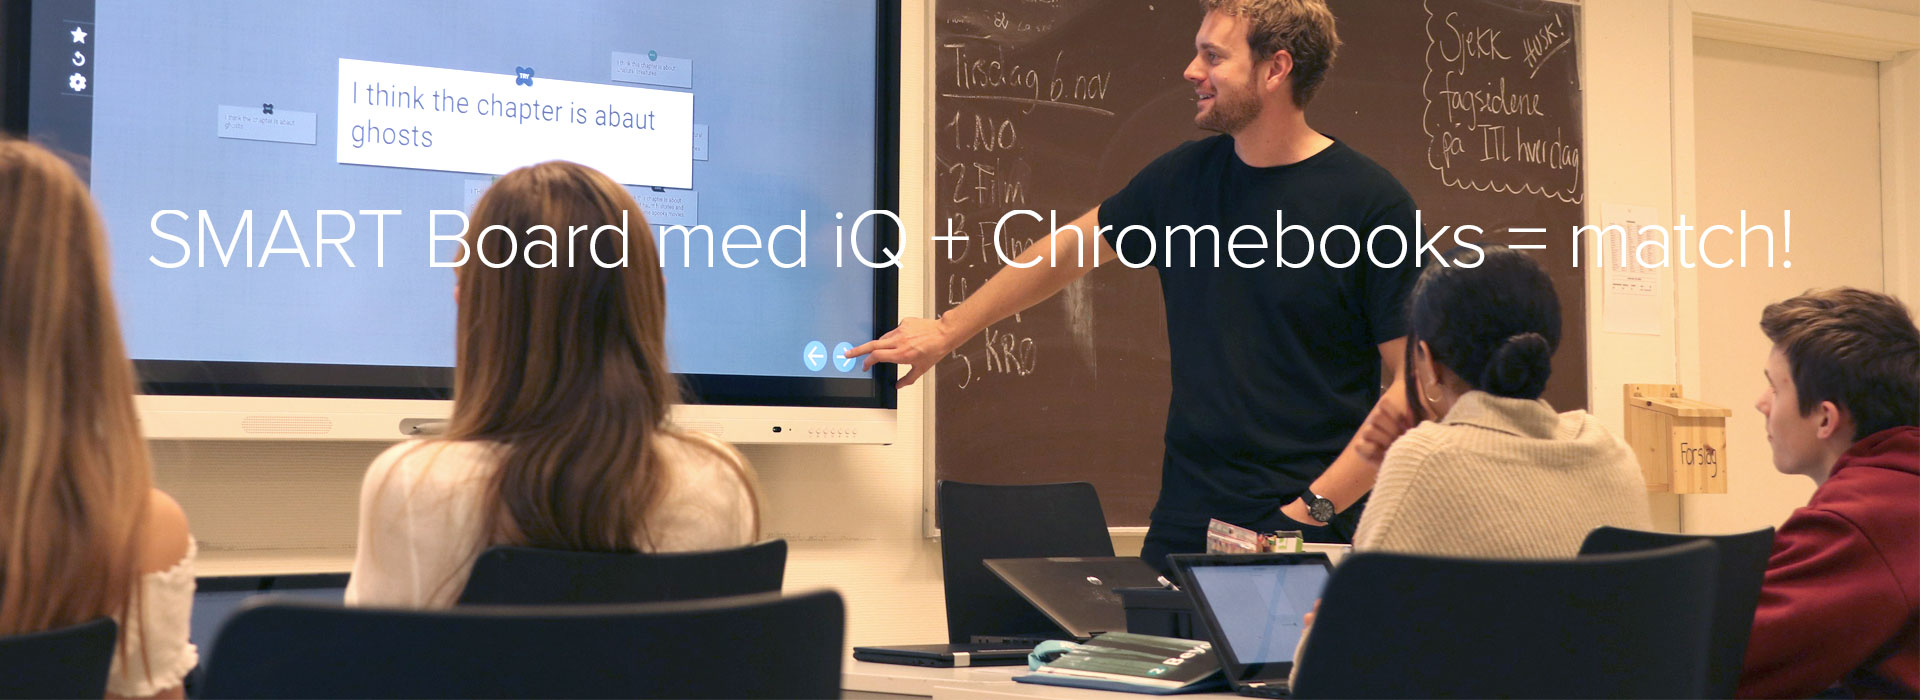 SMART Board med iQ Chromebook GoogleSkole